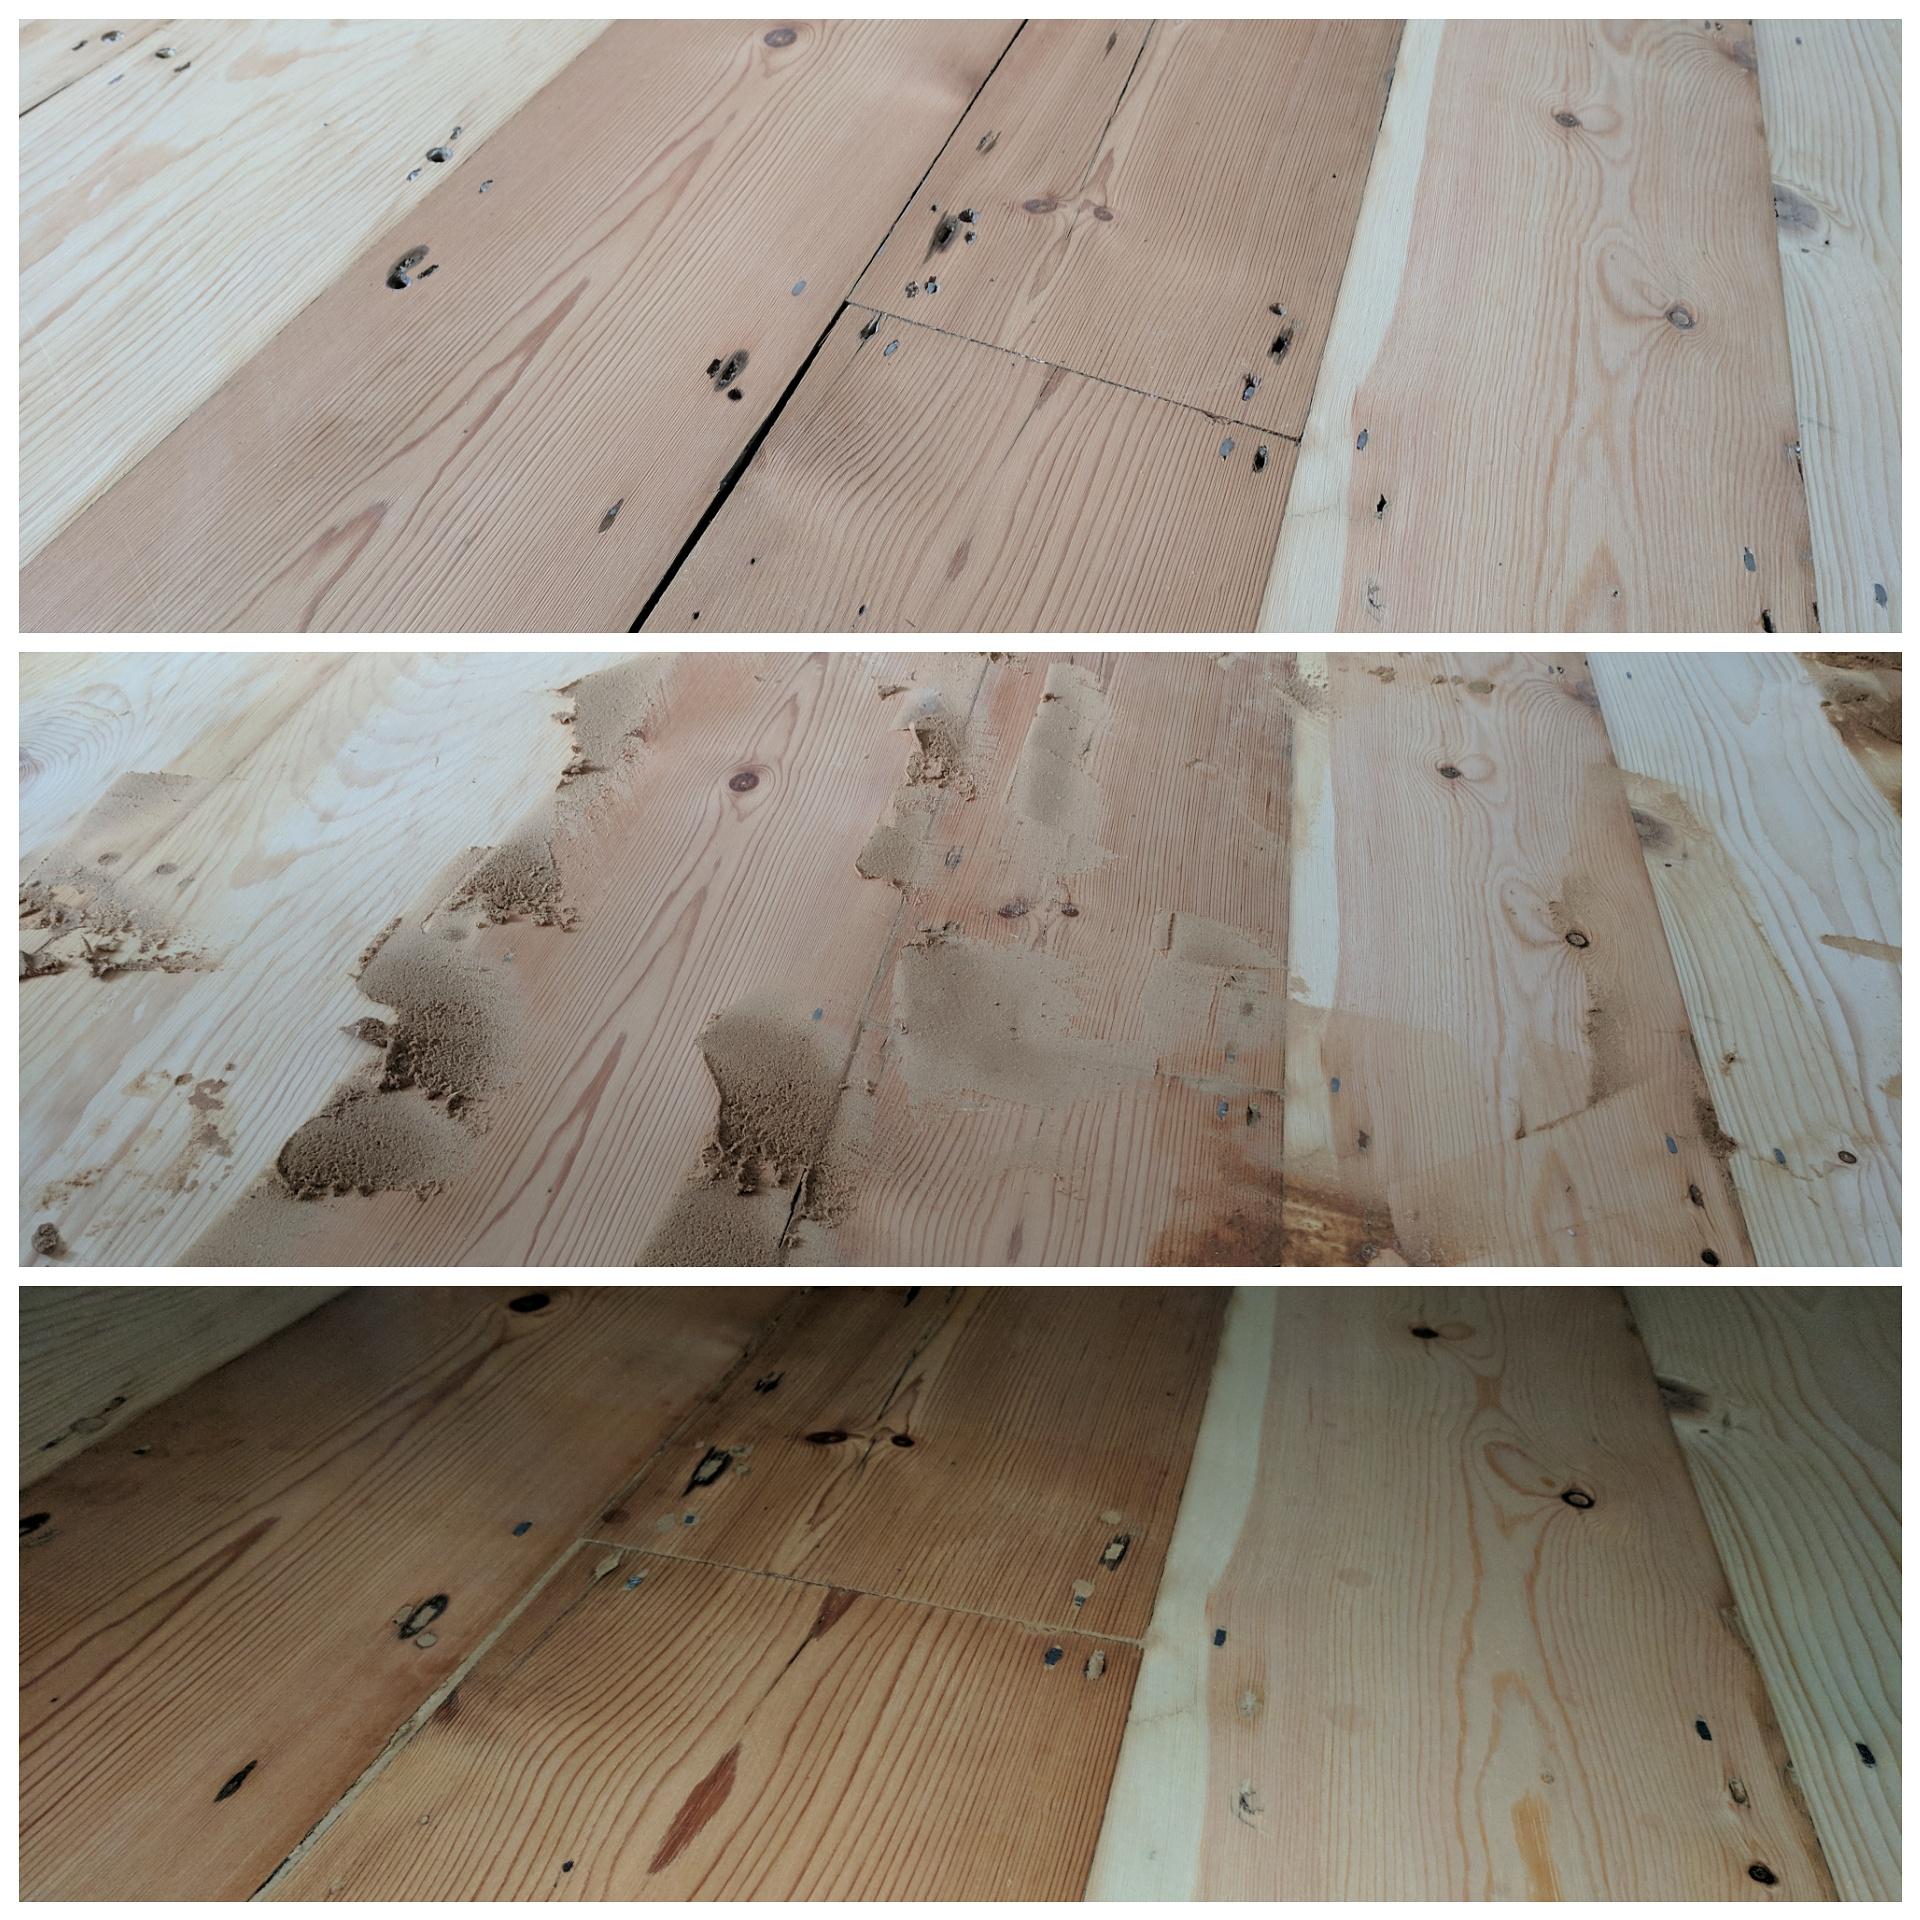 resin gap filling process absolute floor sanding and refinishing. Black Bedroom Furniture Sets. Home Design Ideas